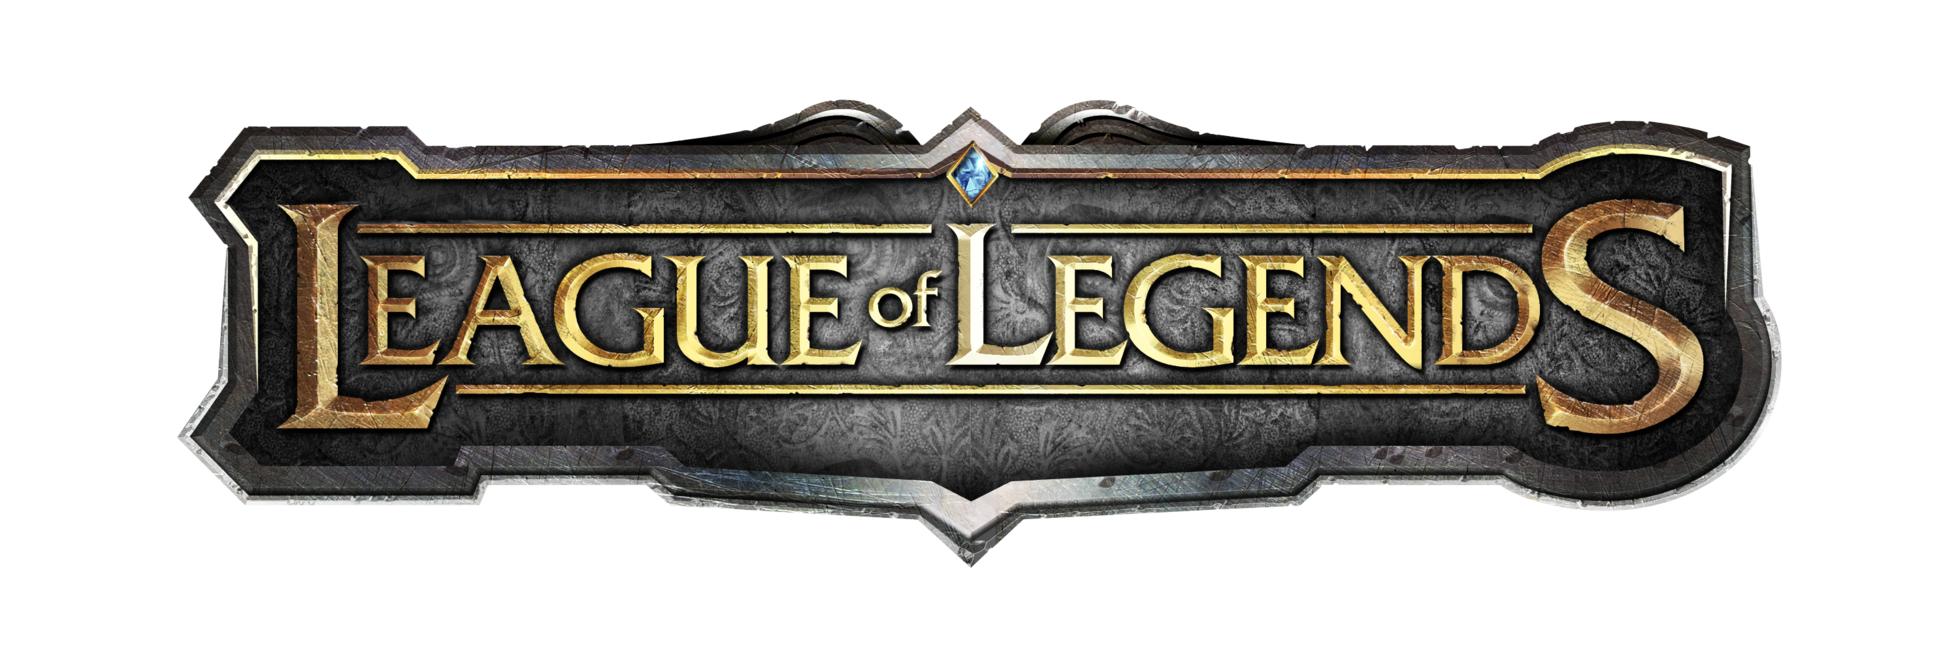 League of Legends old Logo